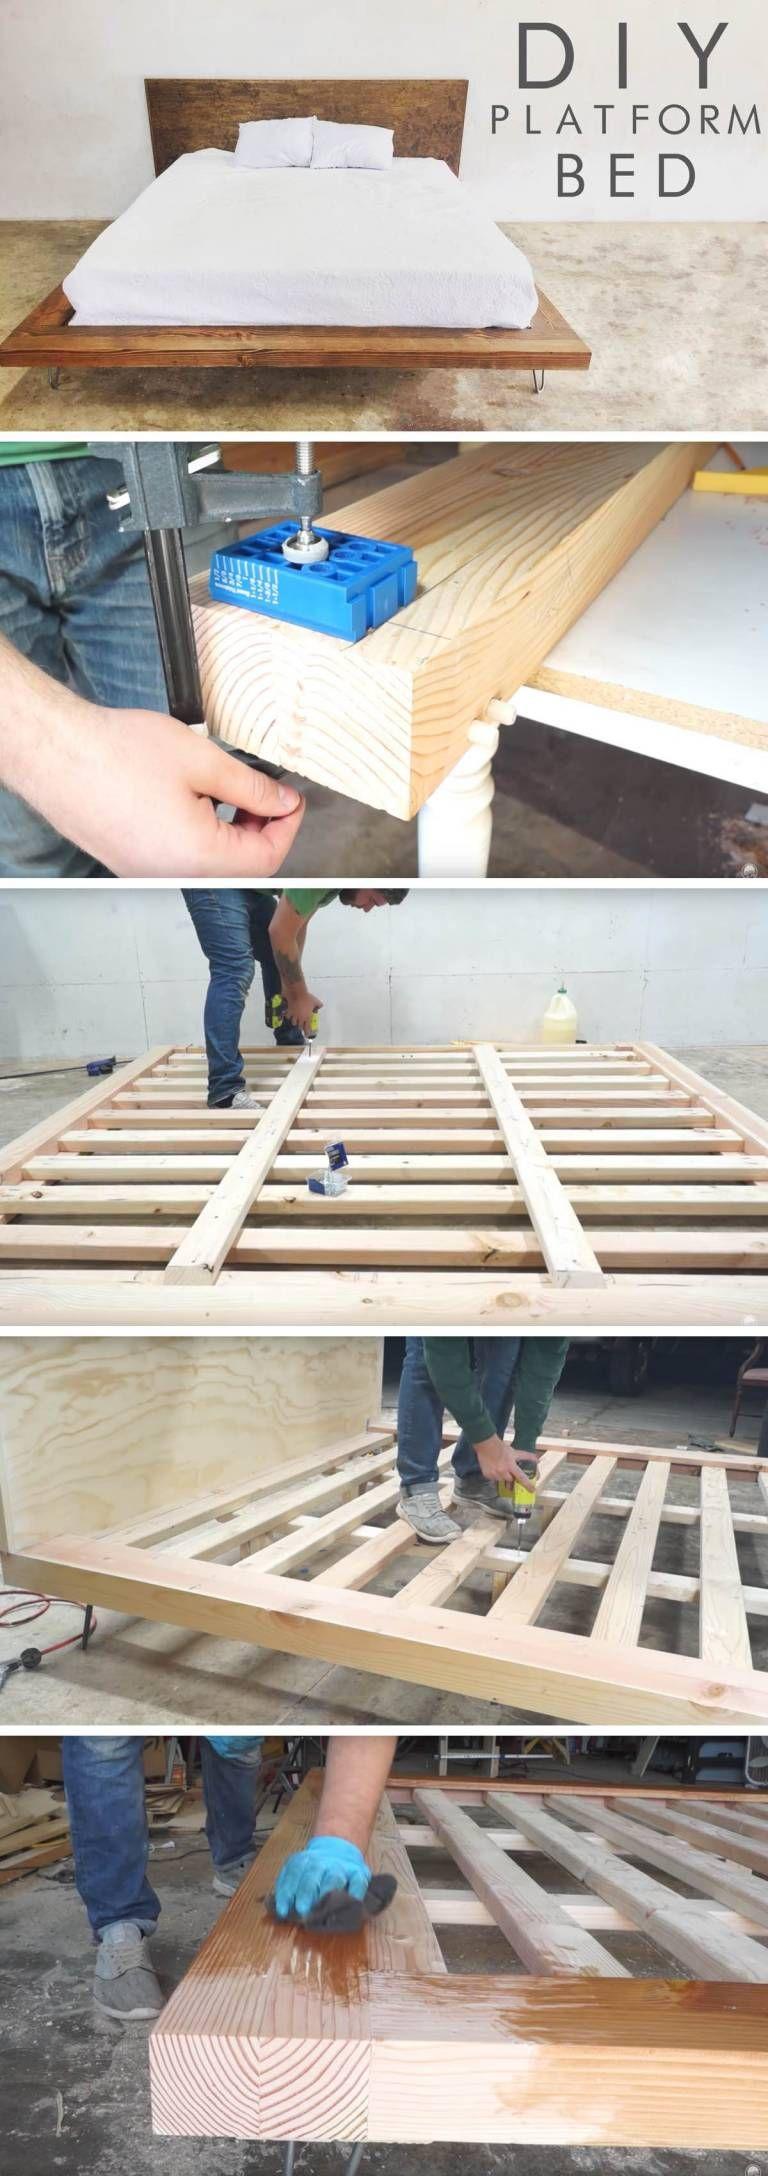 Wonderful Diy Modern Platform Bed Modern Platform Bed Diy Platform Bed Diy Bed